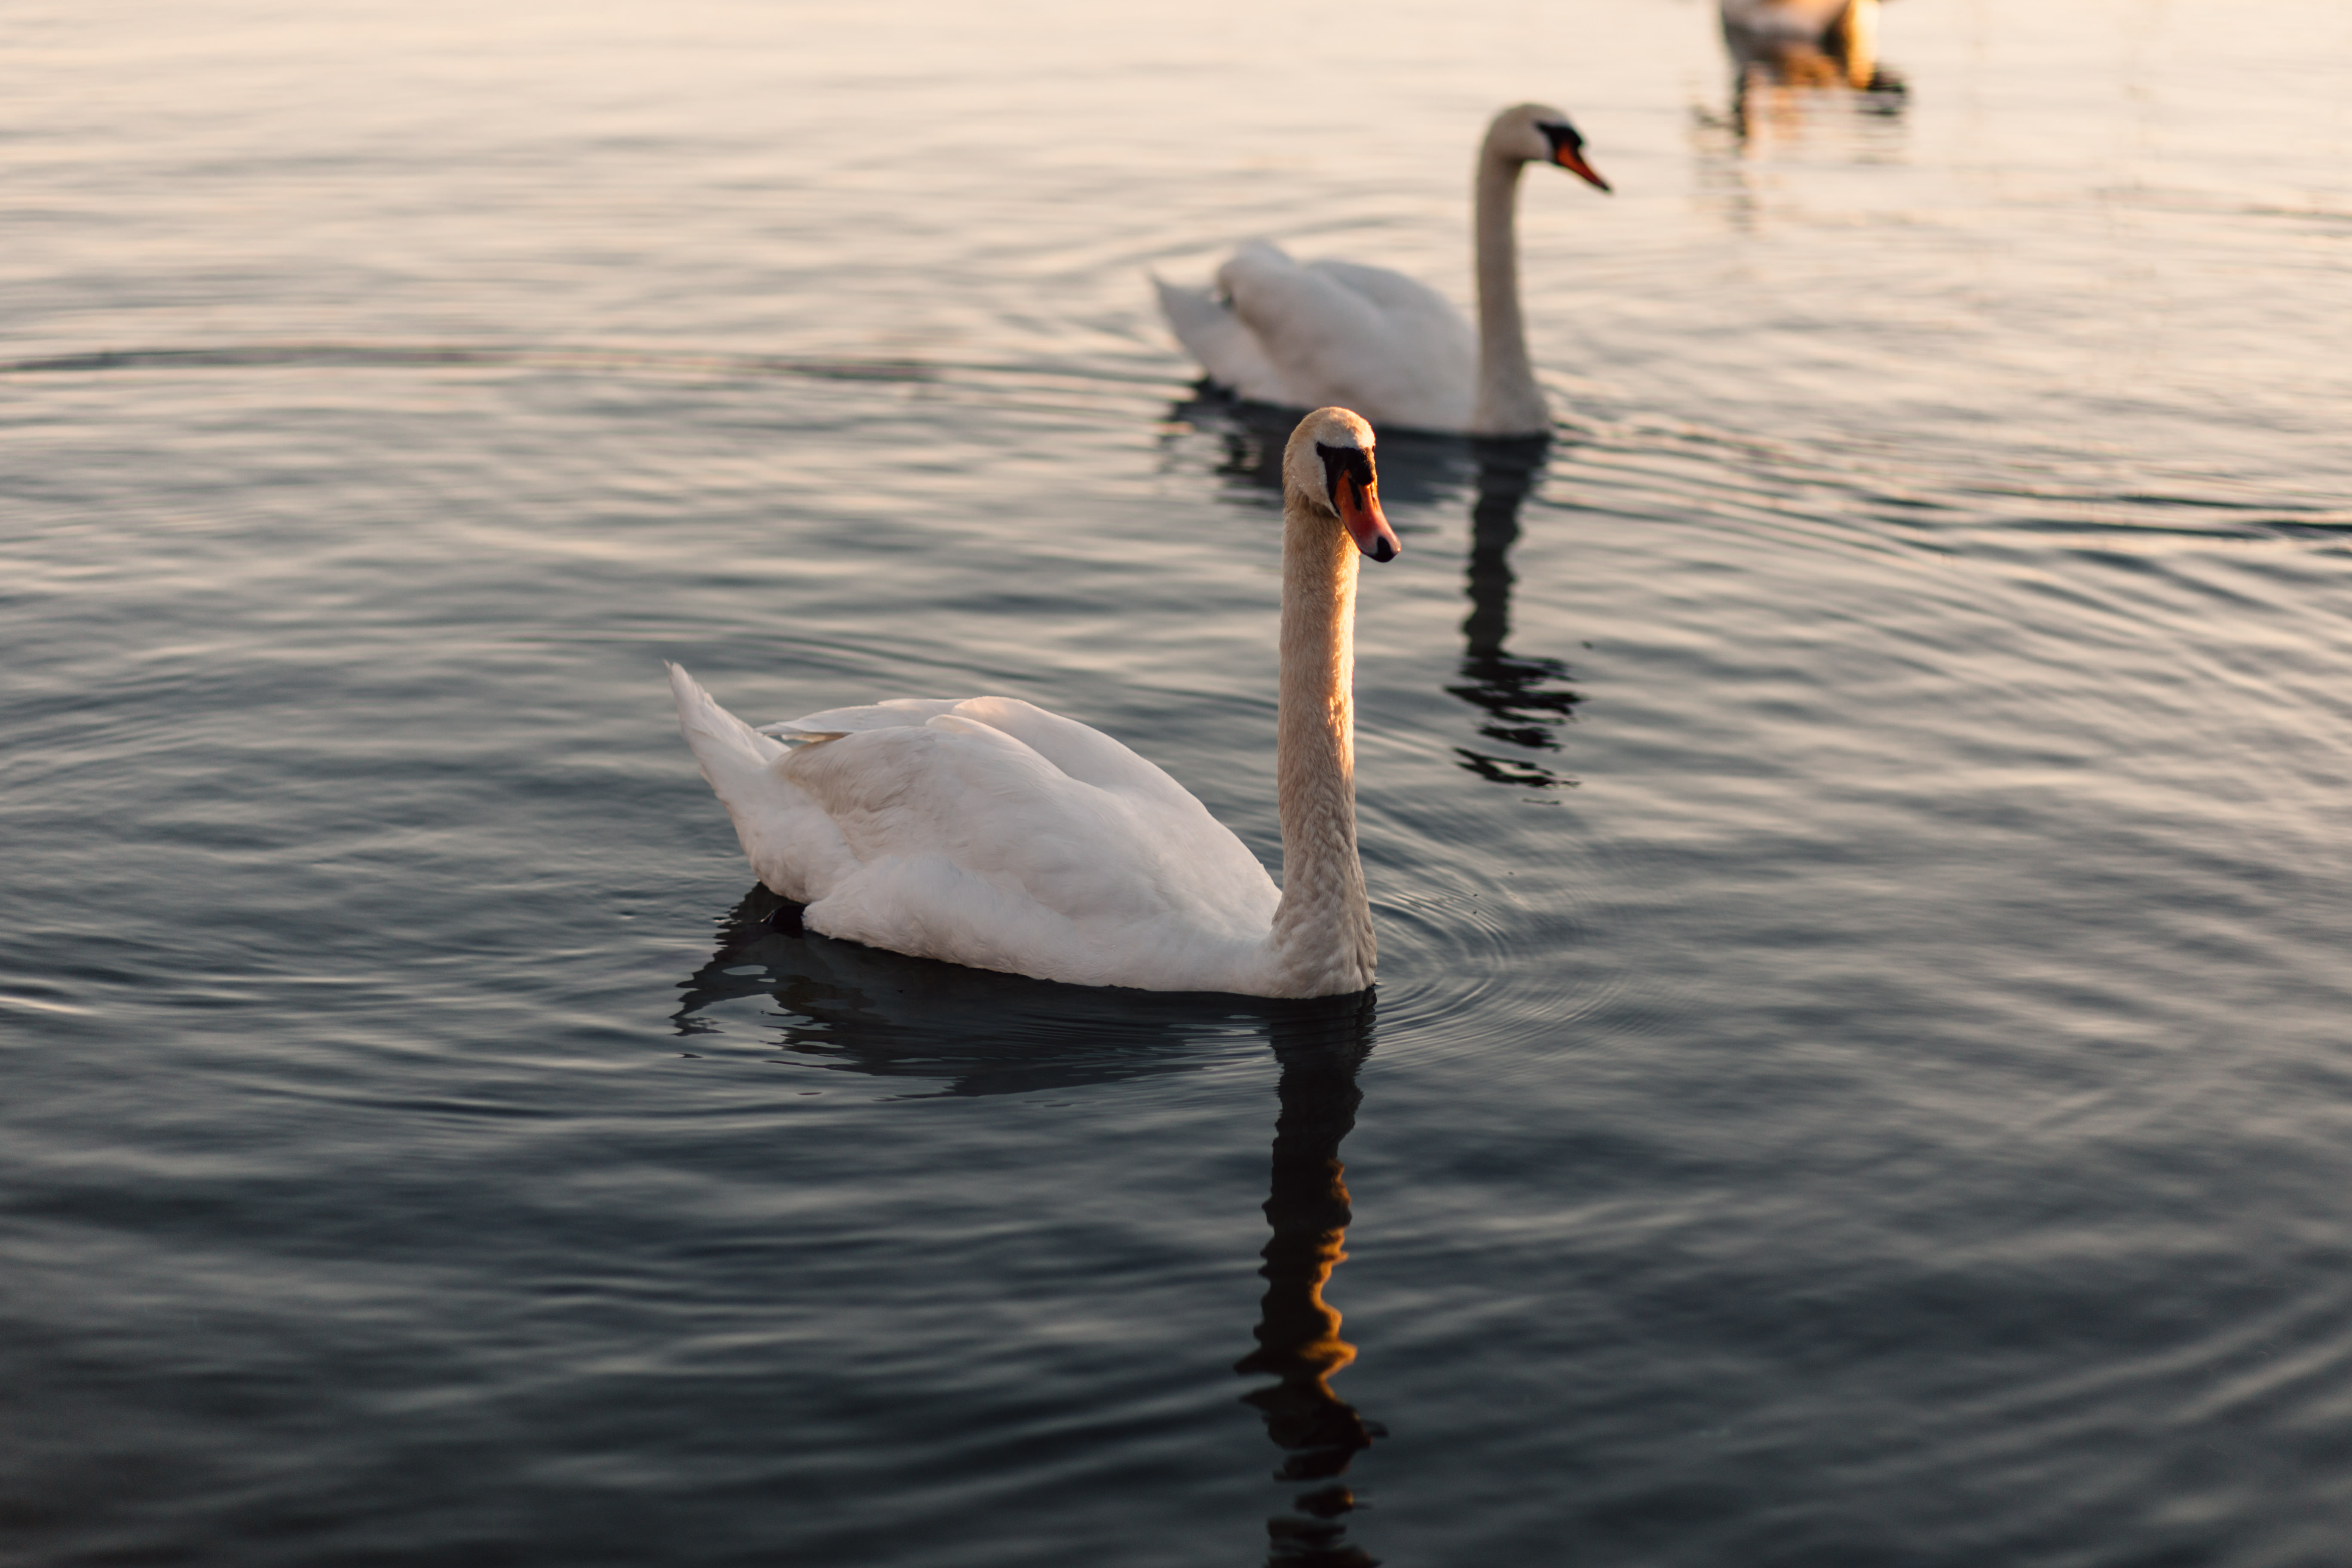 Two Ducks, Bird, Ducks, Lake, River, HQ Photo